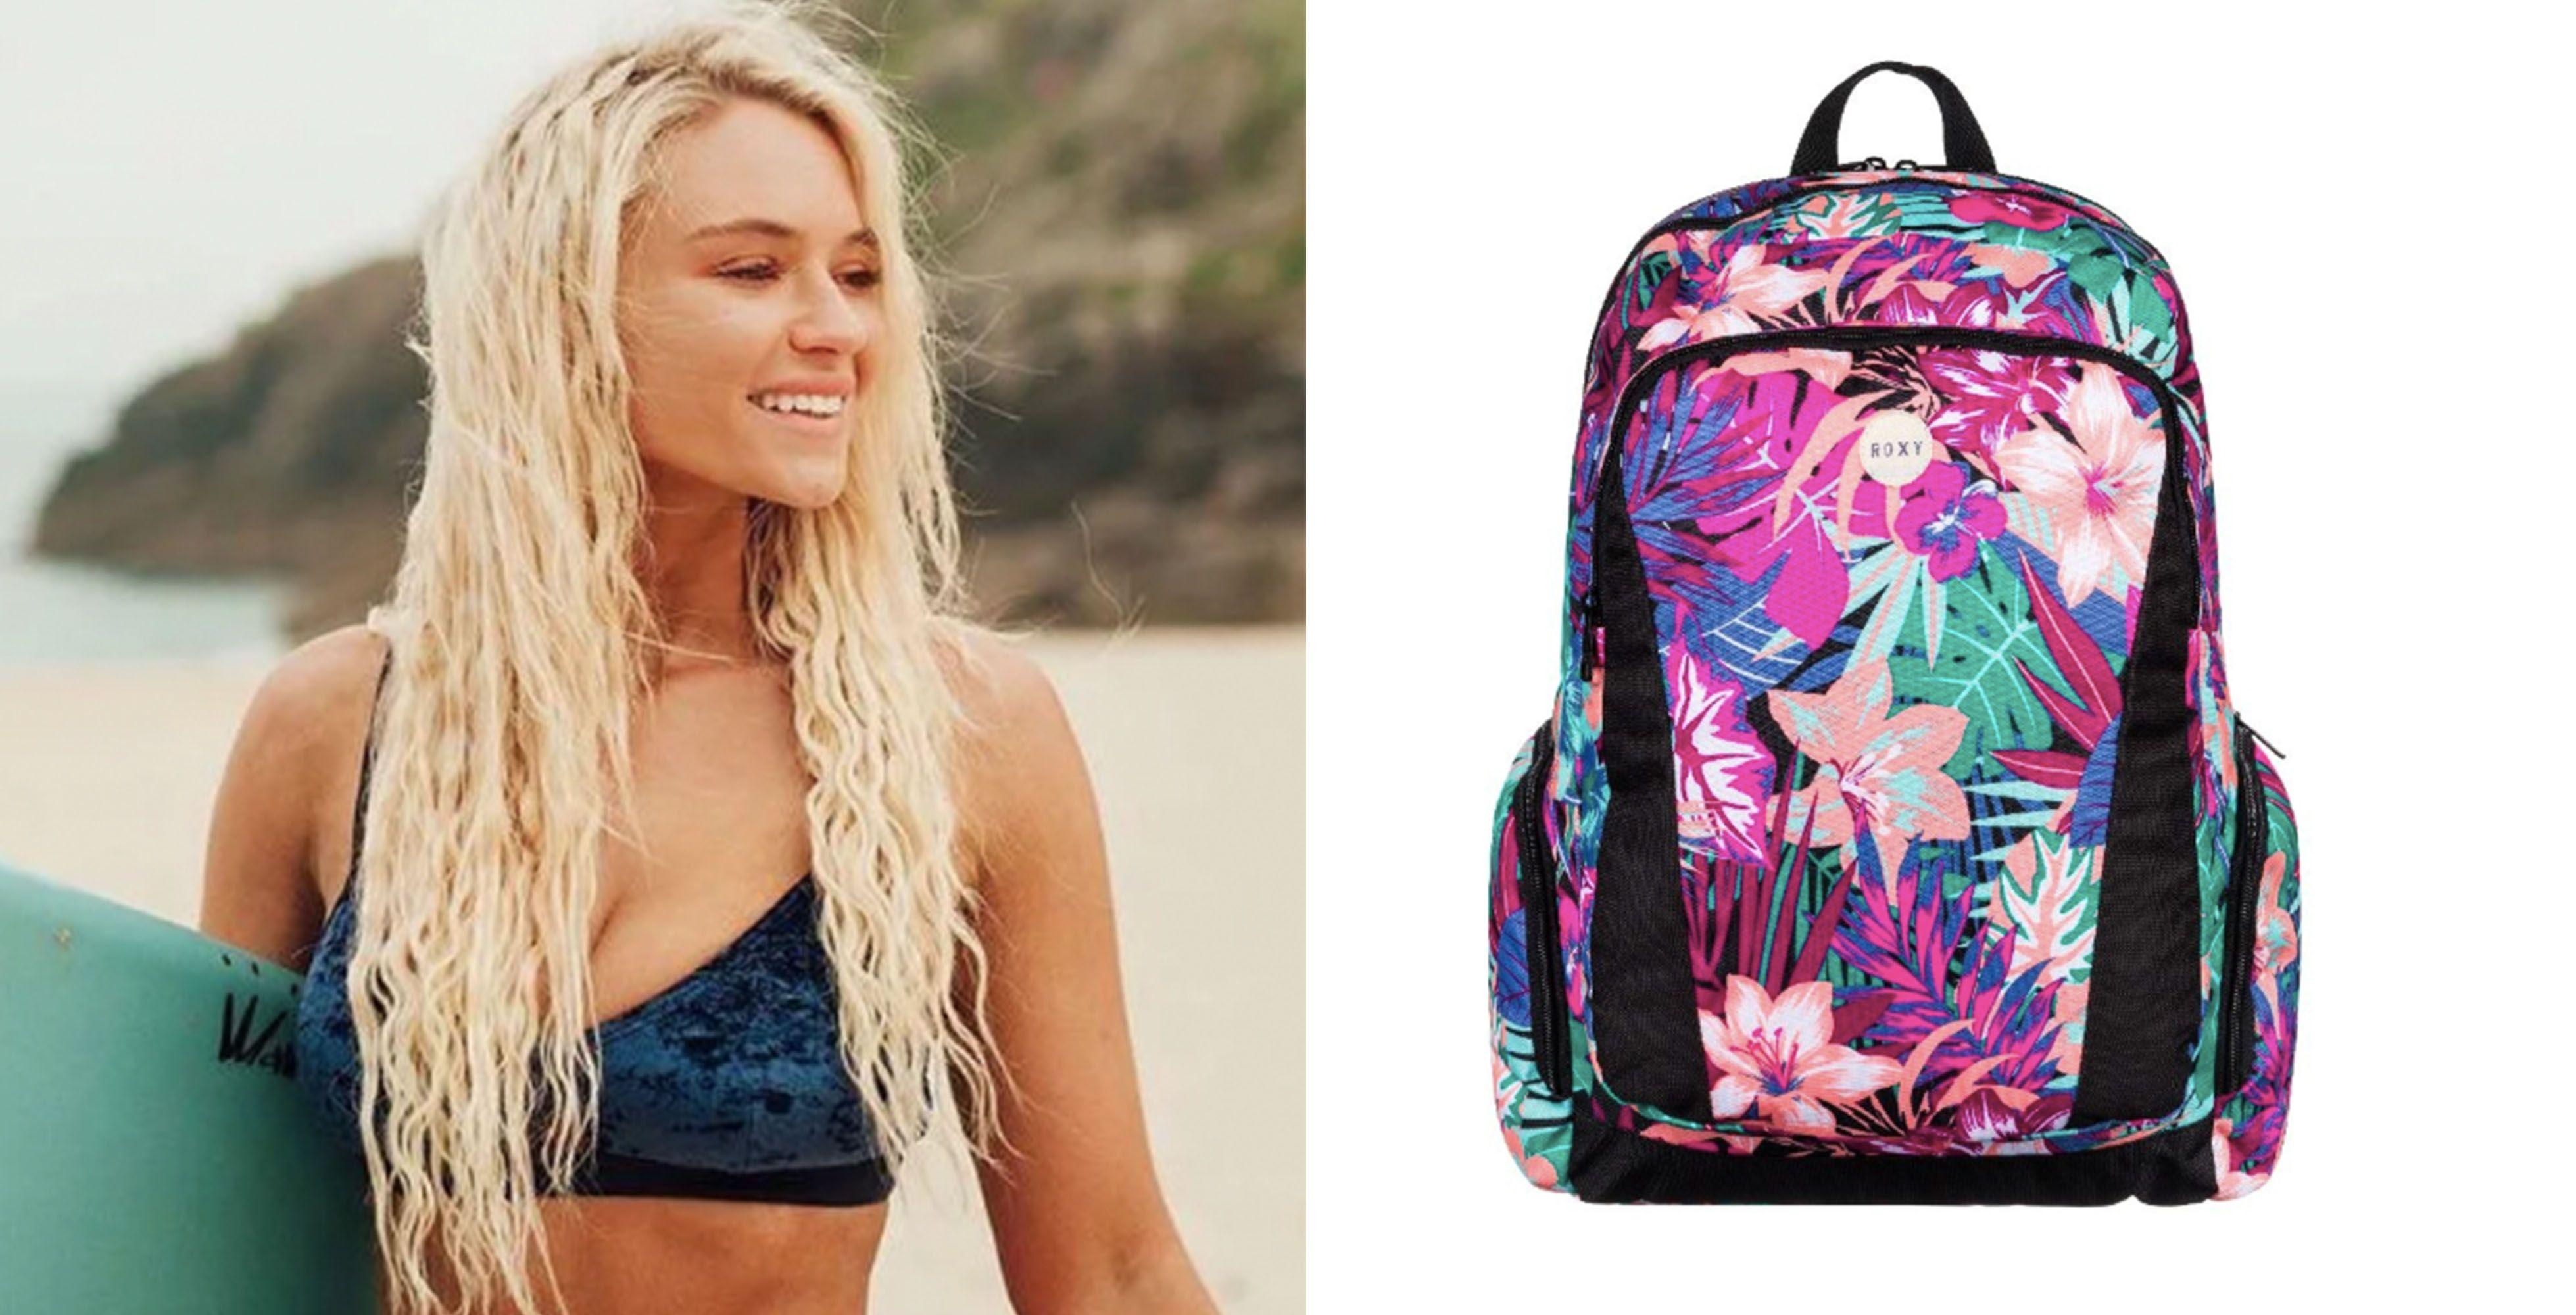 Image may contain: Person, Human, Bag, Backpack